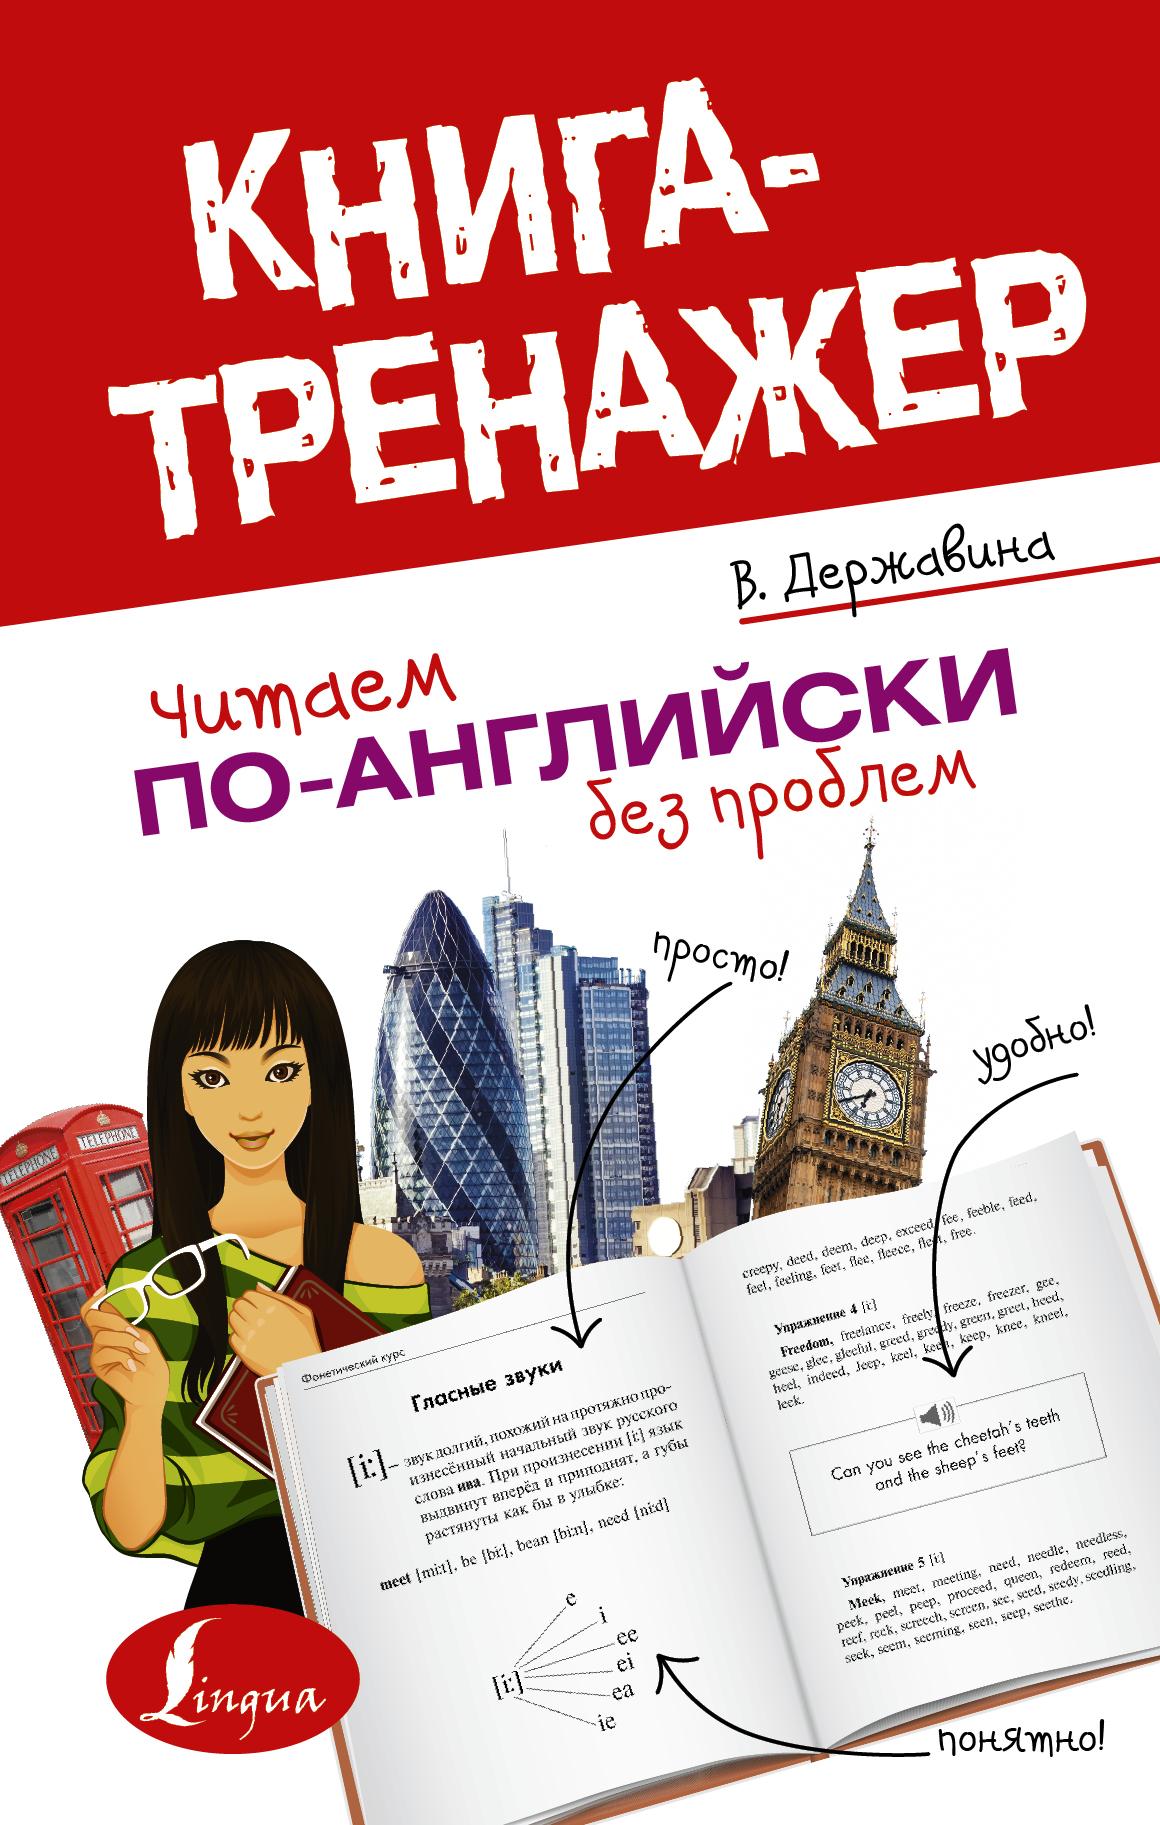 Читаем по-английски без проблем. Читаем по-английски. Книга-тренажер для начинающих - Виктория Державина